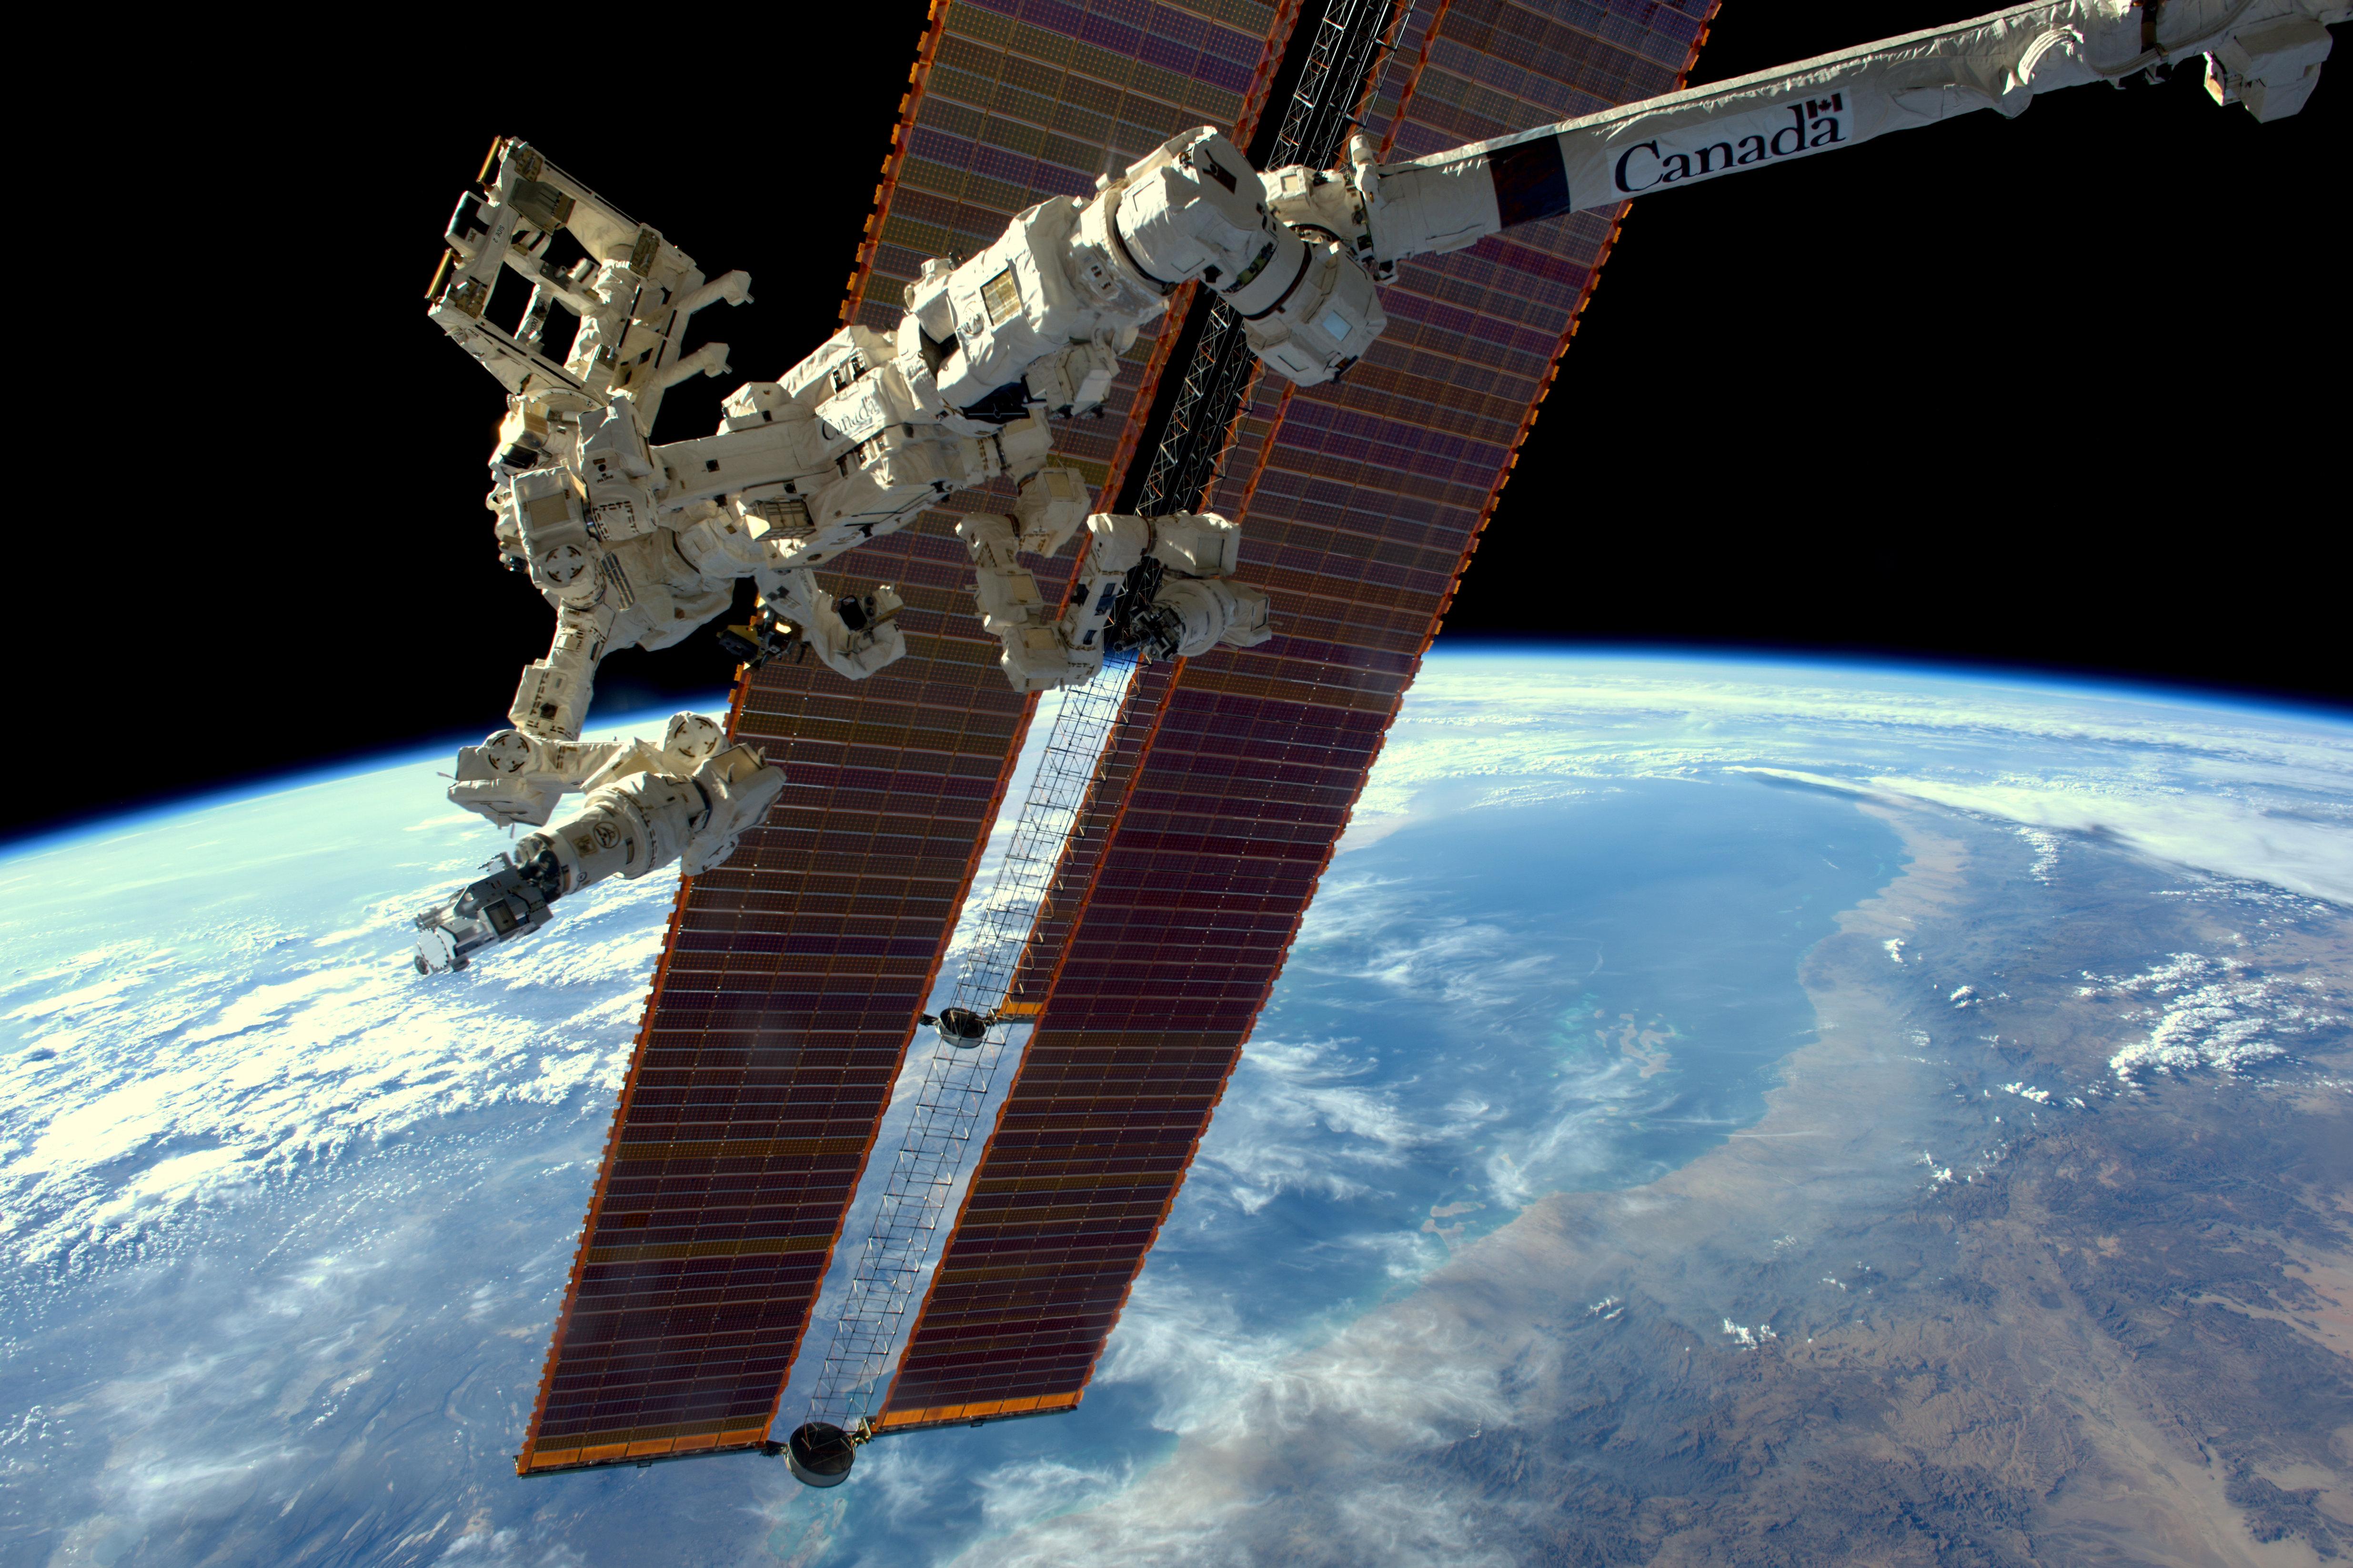 Nasa S Robotic Sniffer Confirms Space Station Leak